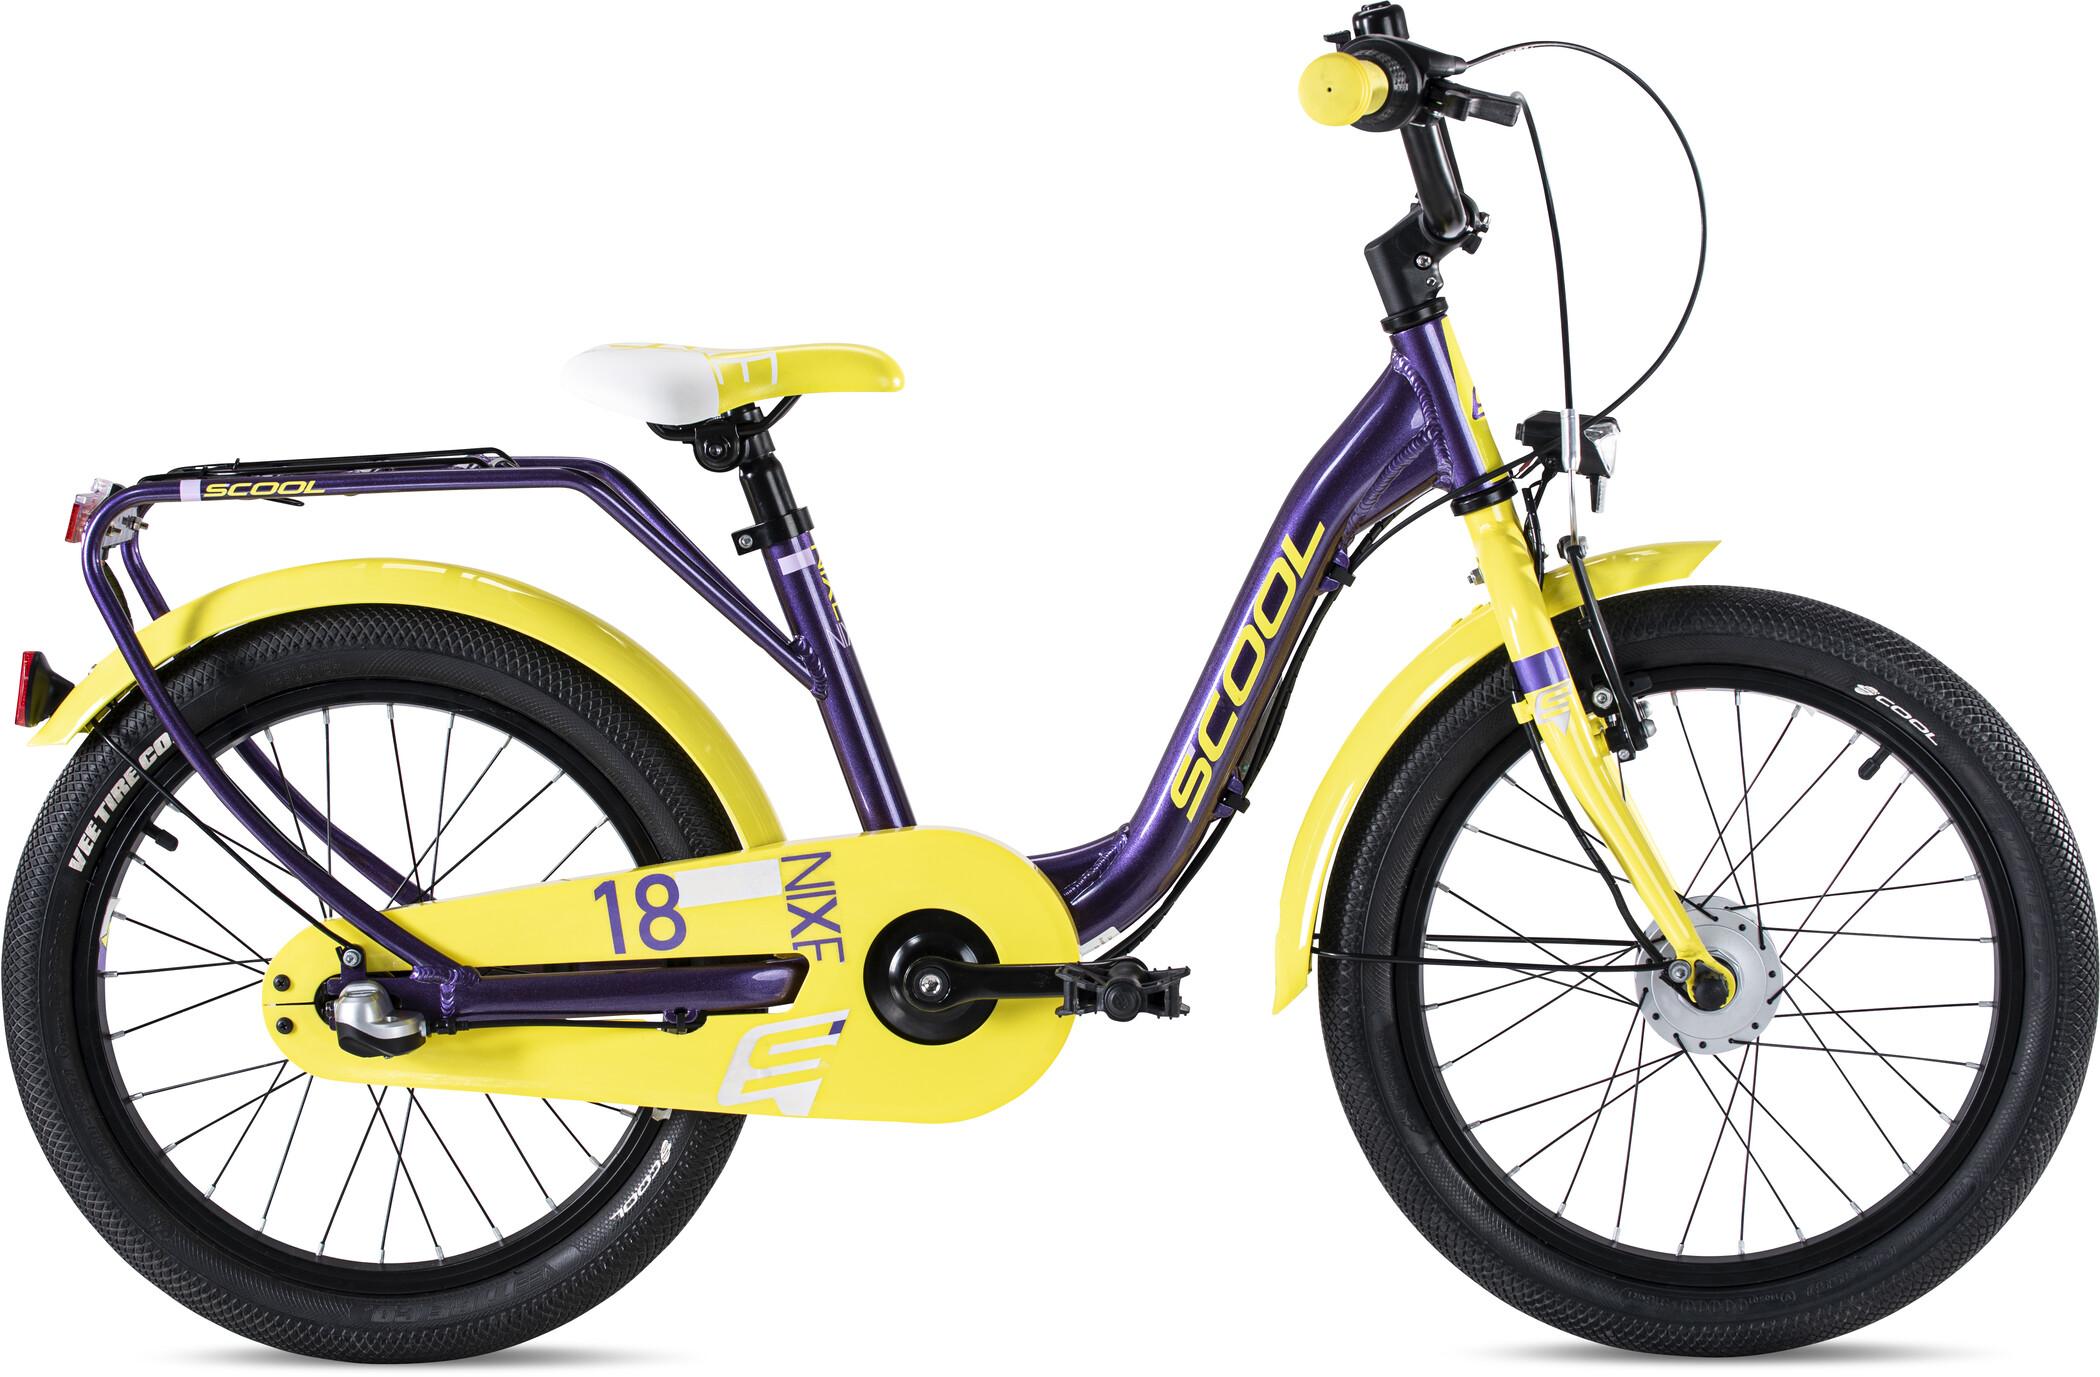 nixe fahrrad 16 zoll